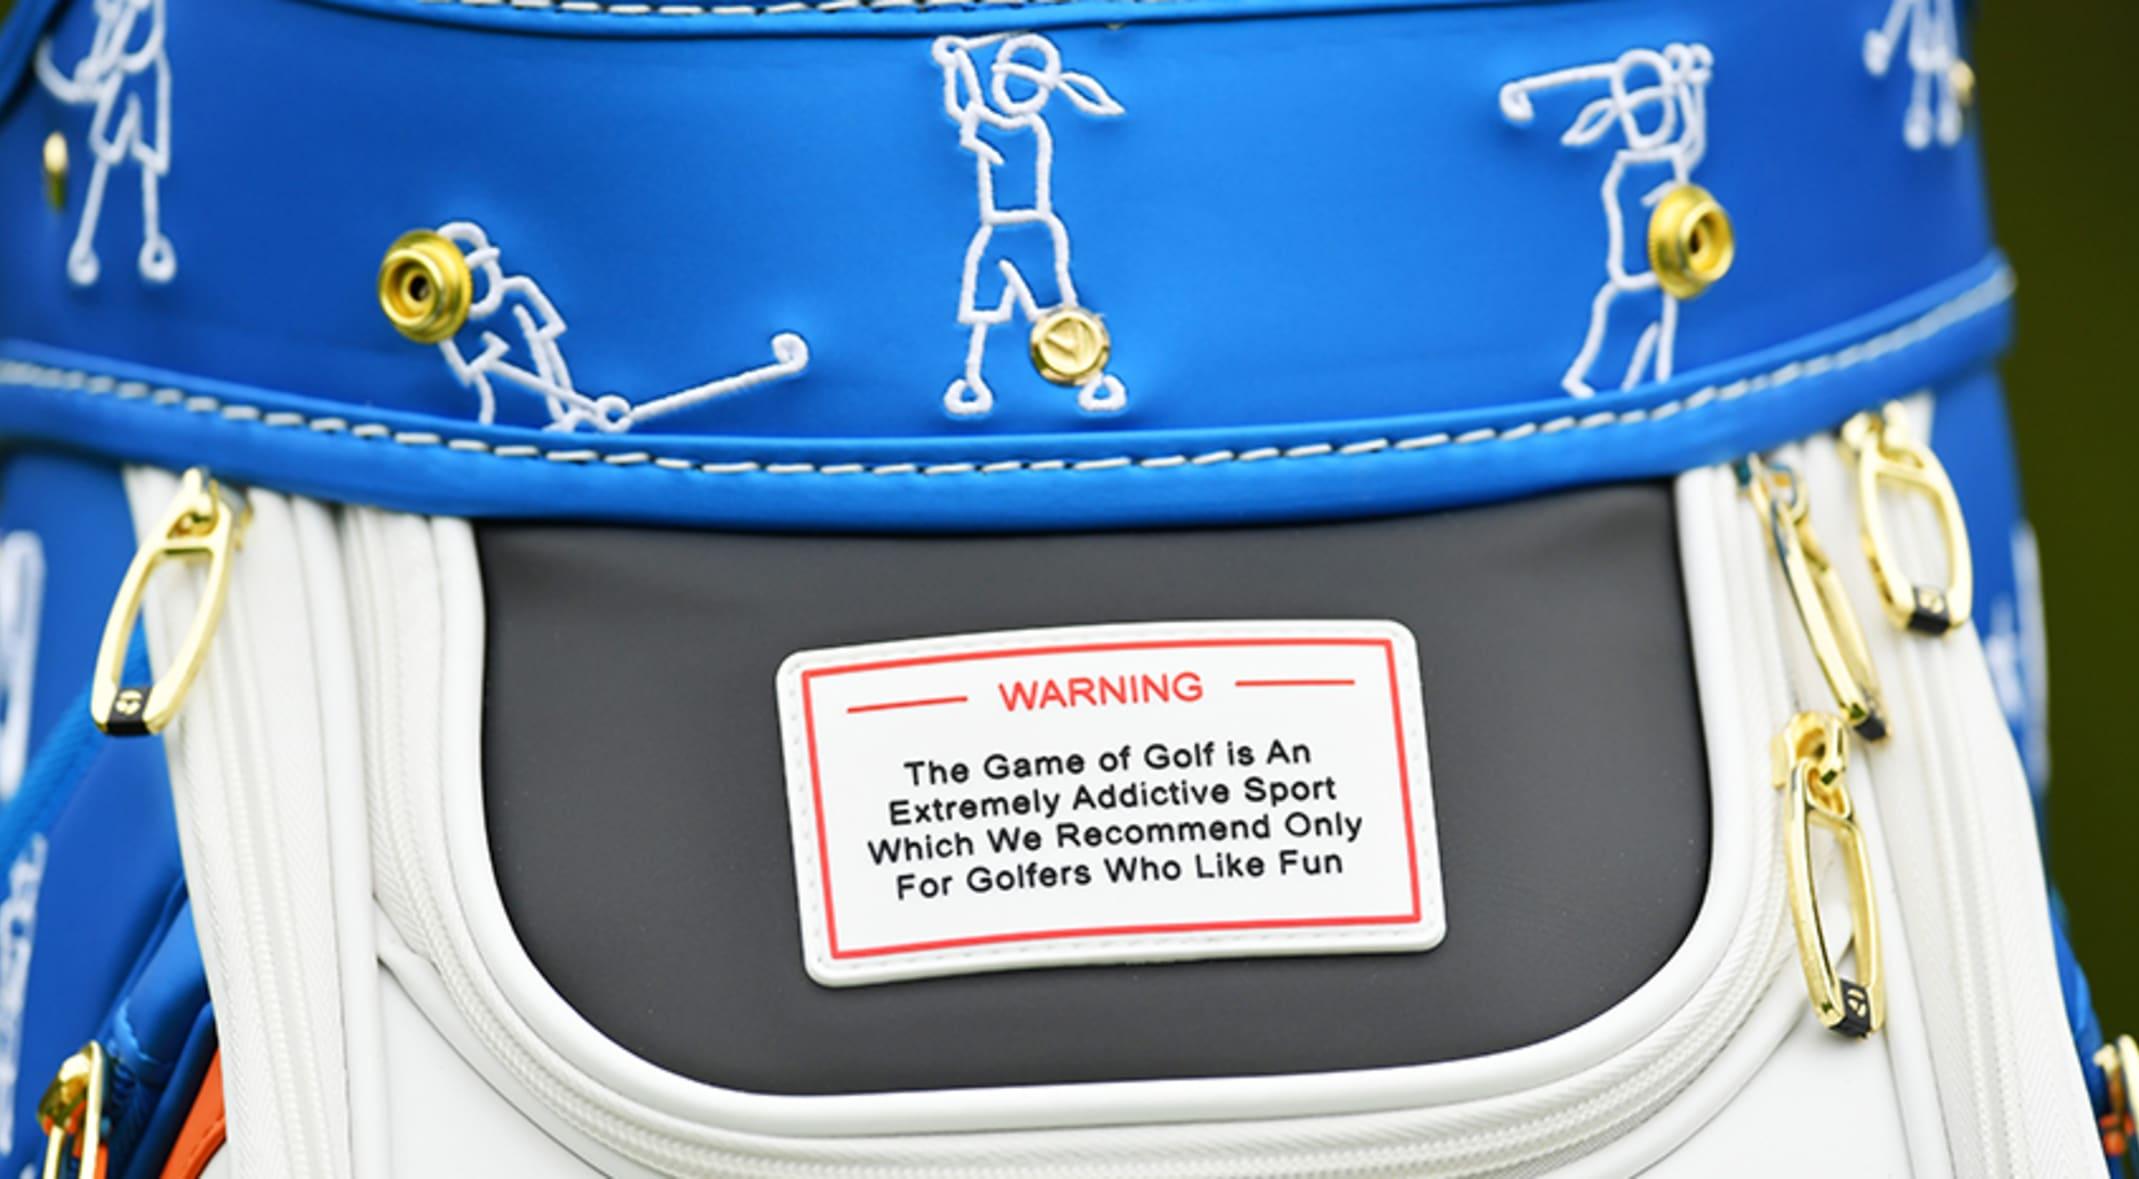 a76716bd40e8ff A custom Taylormade staff bag for the 2019 PGA Championship at Bethpage  Black (Stuart Franklin